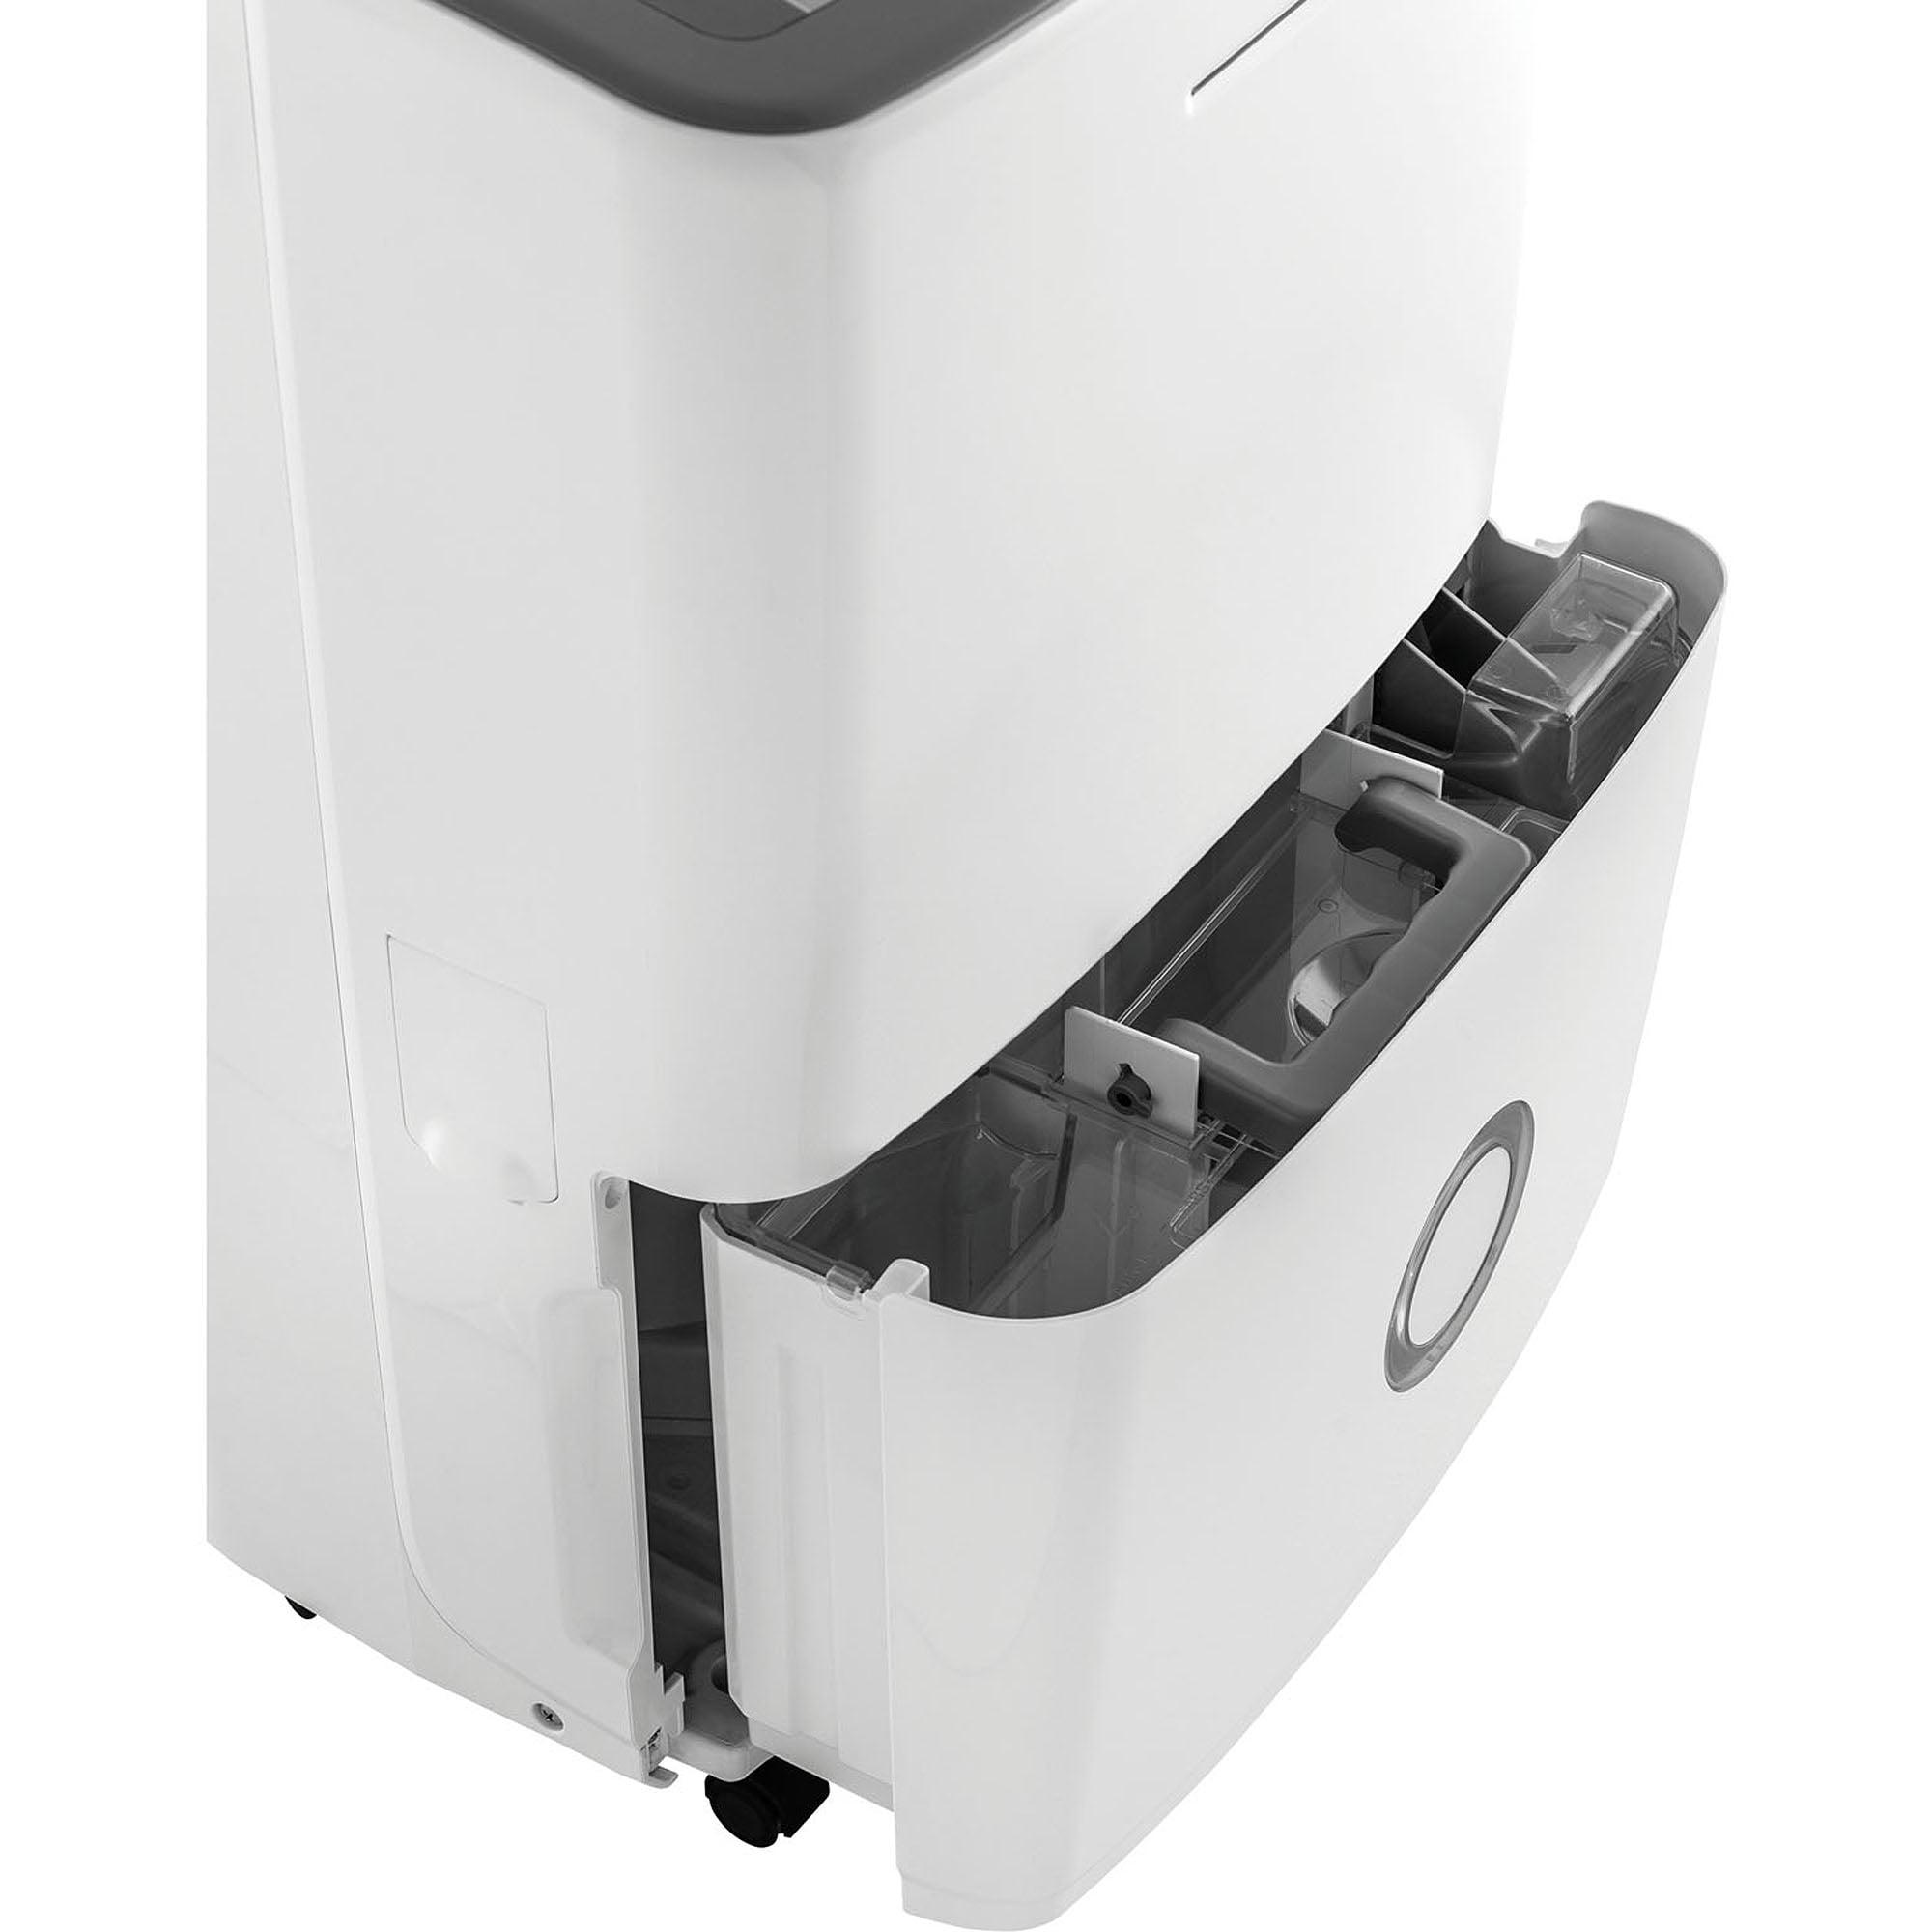 Frigidaire 70Pint Dehumidifier w Effortless Humidity Control